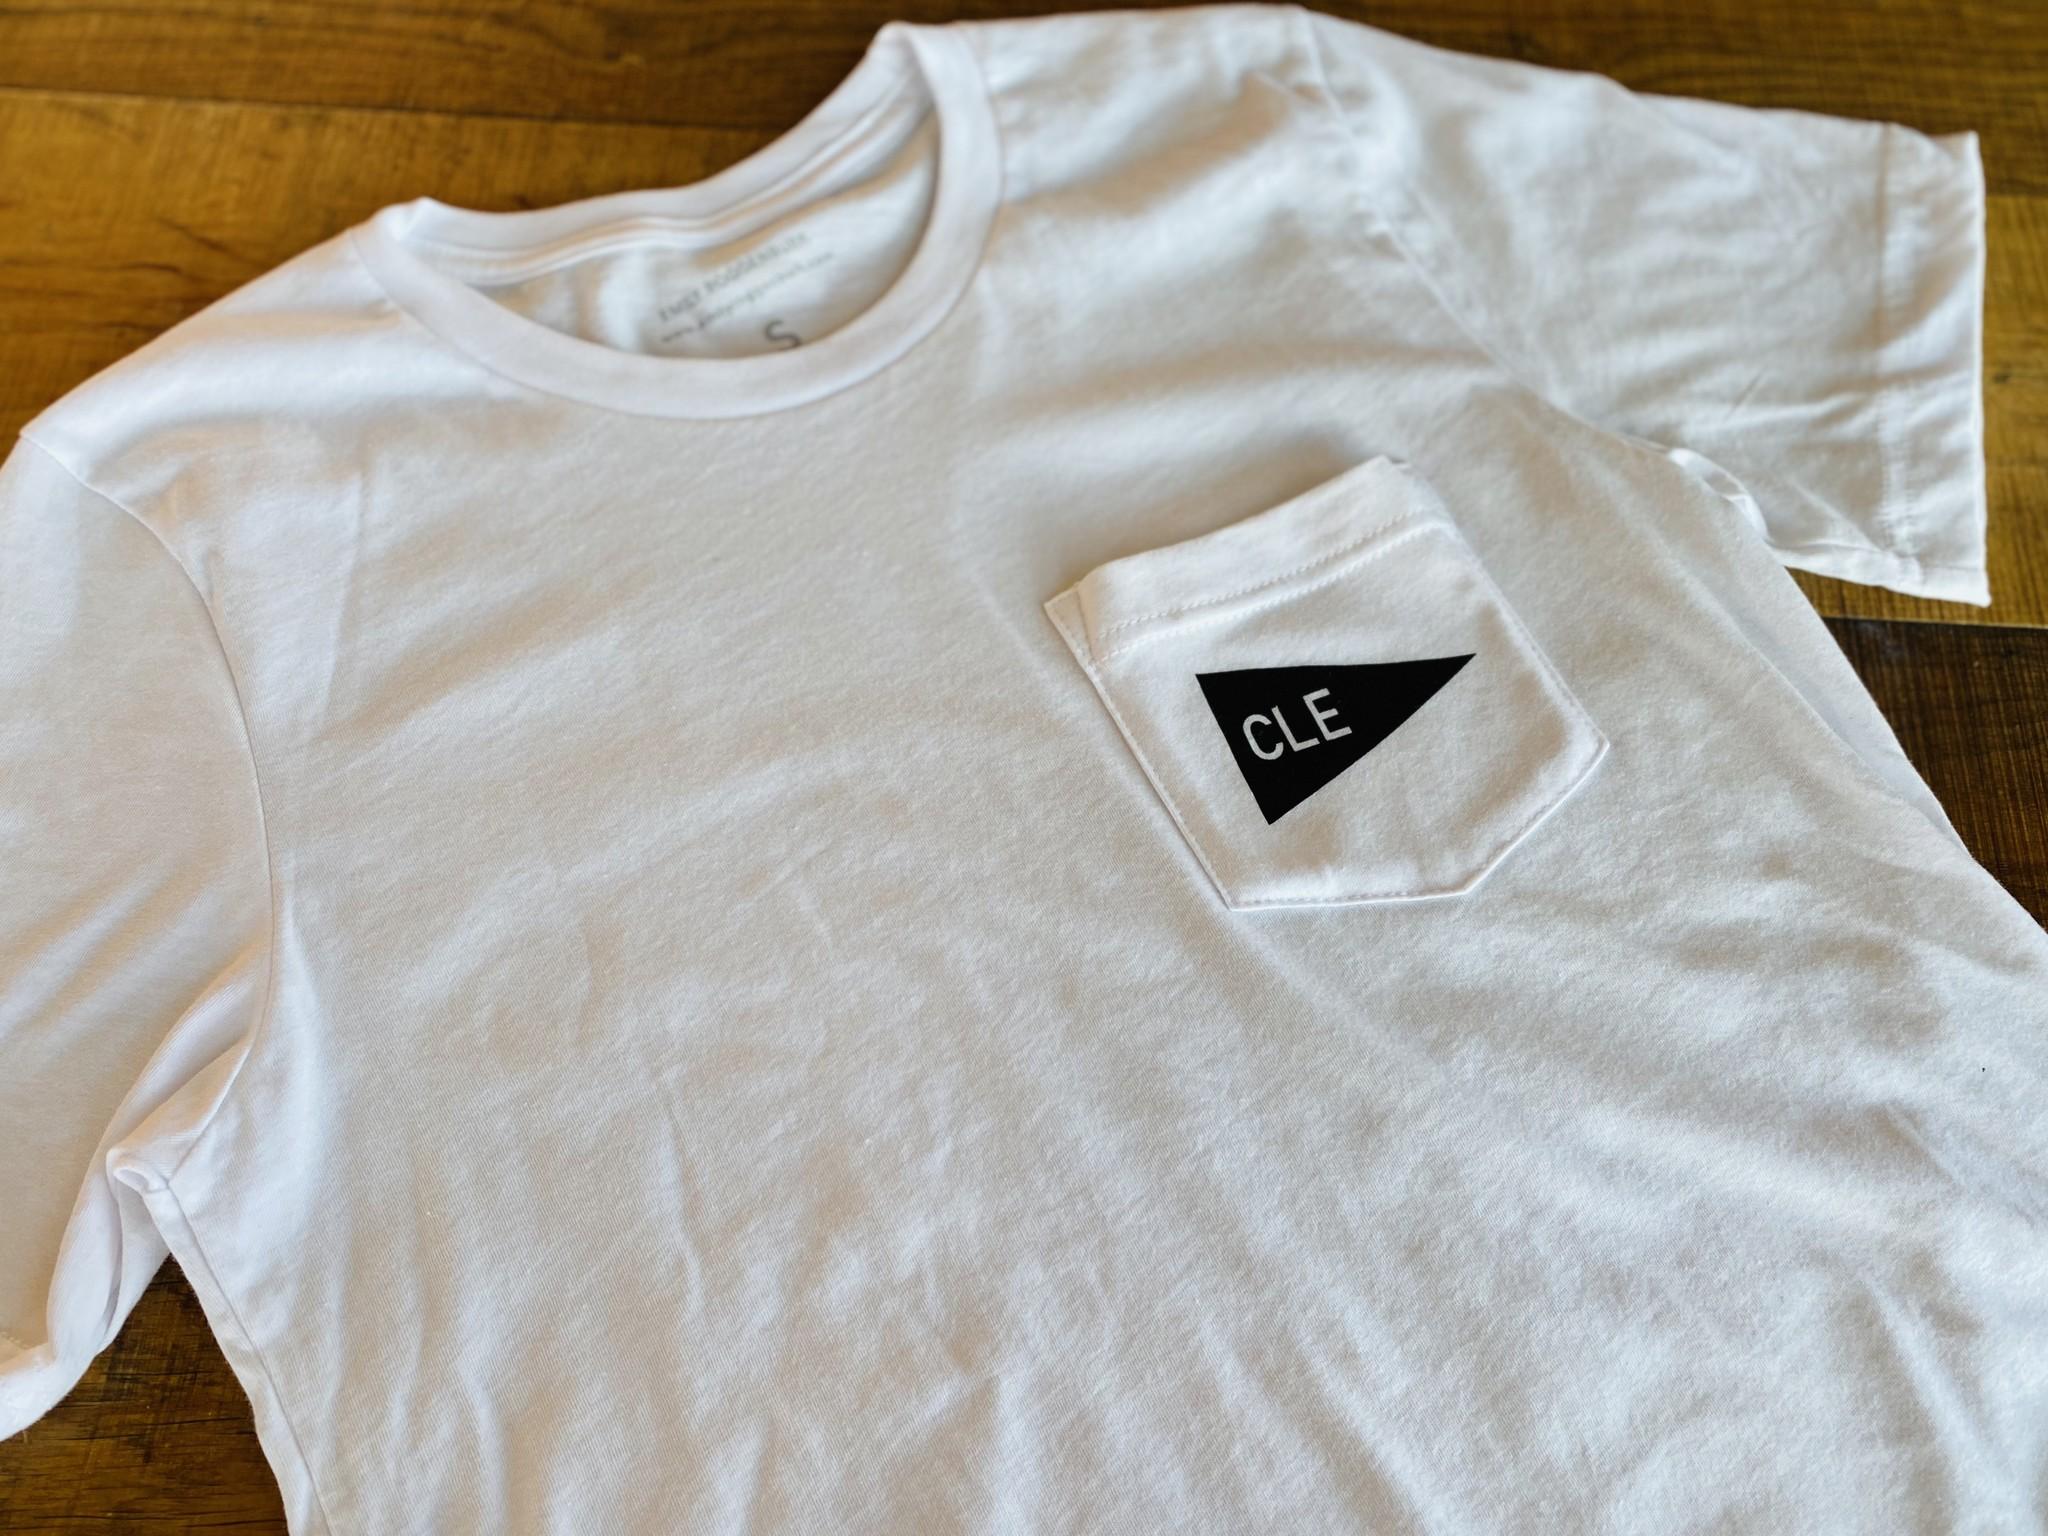 CLE Pennant T-Shirt (by emilyroggenburk)